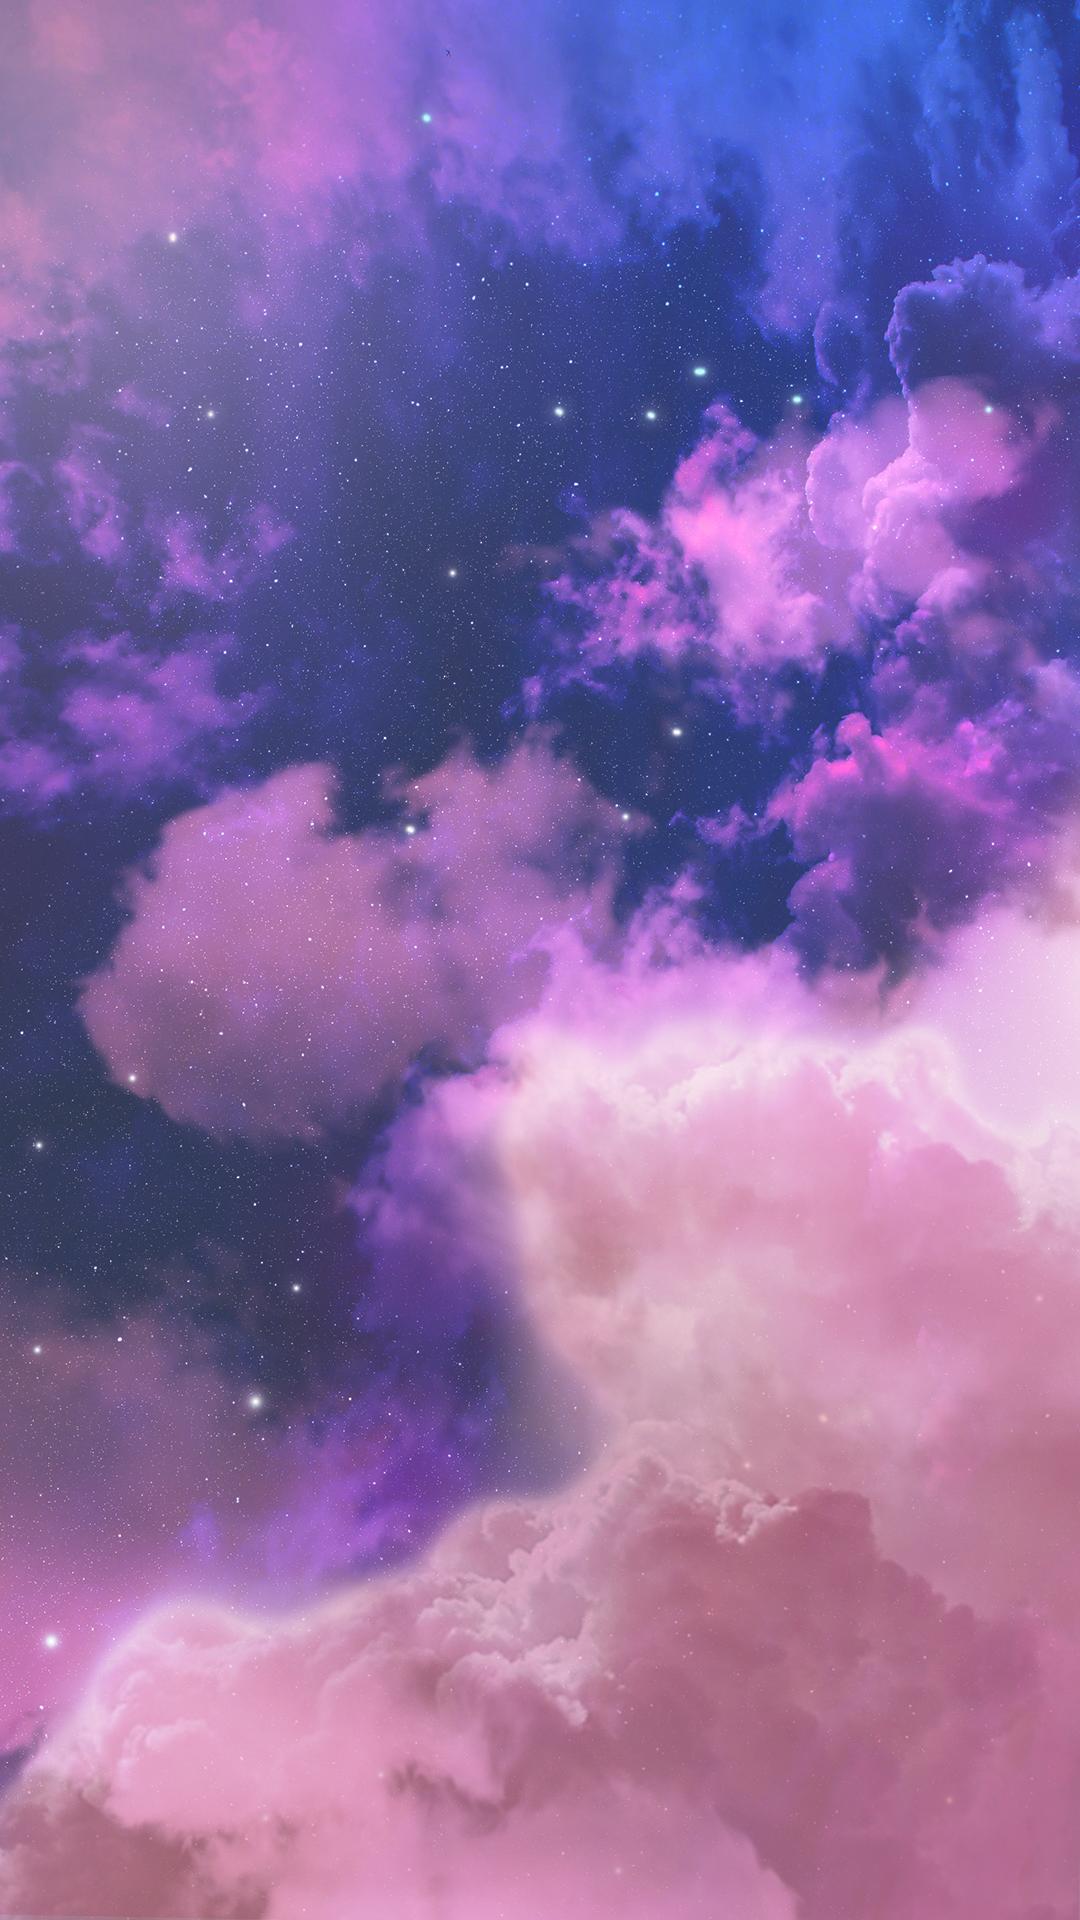 Wallpaper Purple Sky By Gocase Wallpapers Roxos Papel De Parede Roxo Wallpaper Nuvem